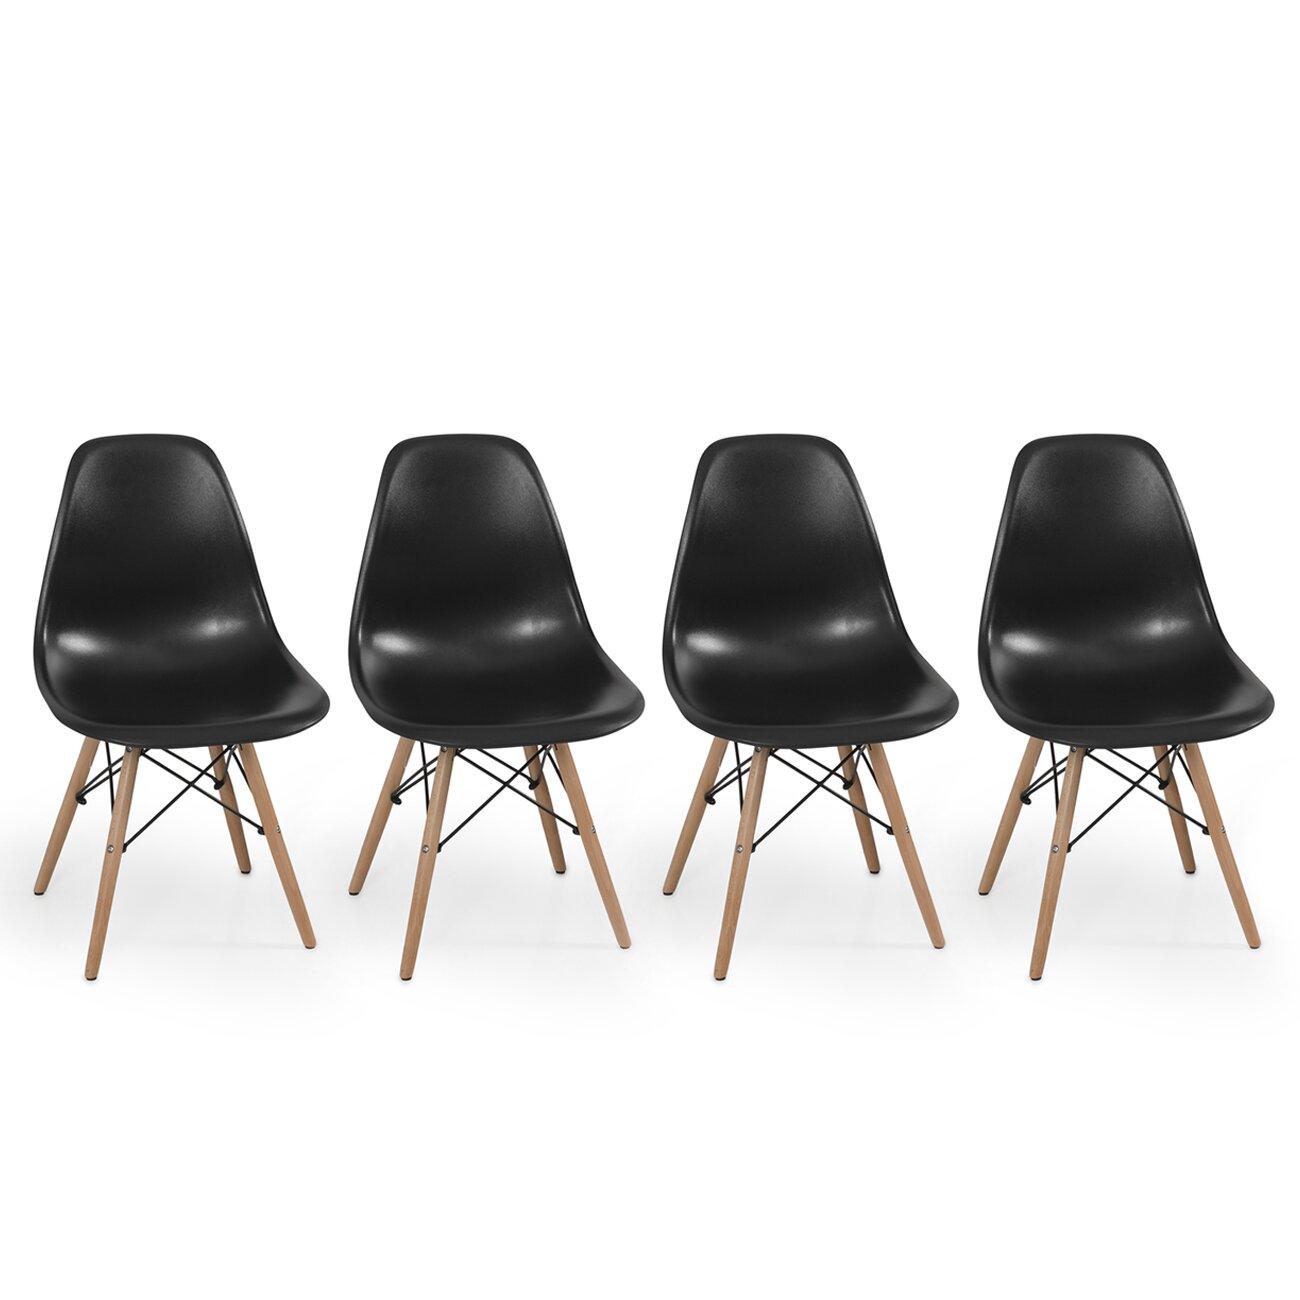 Belleze dowel eames side chair reviews wayfair for Eames side chair nachbau